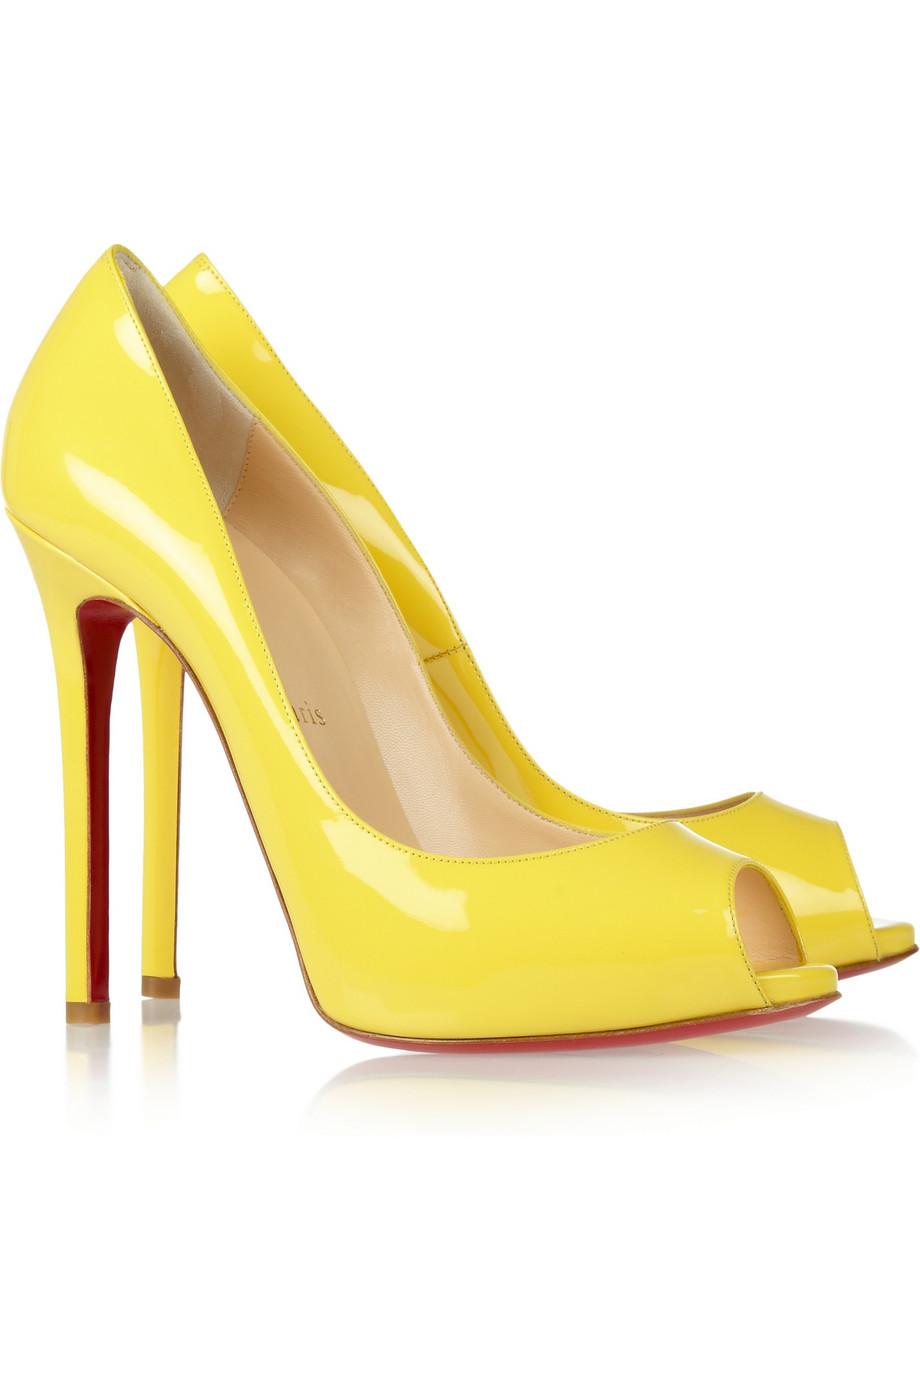 timeless design 1b463 b2d6a christian louboutin yootish peep toe pump, replica christian ...